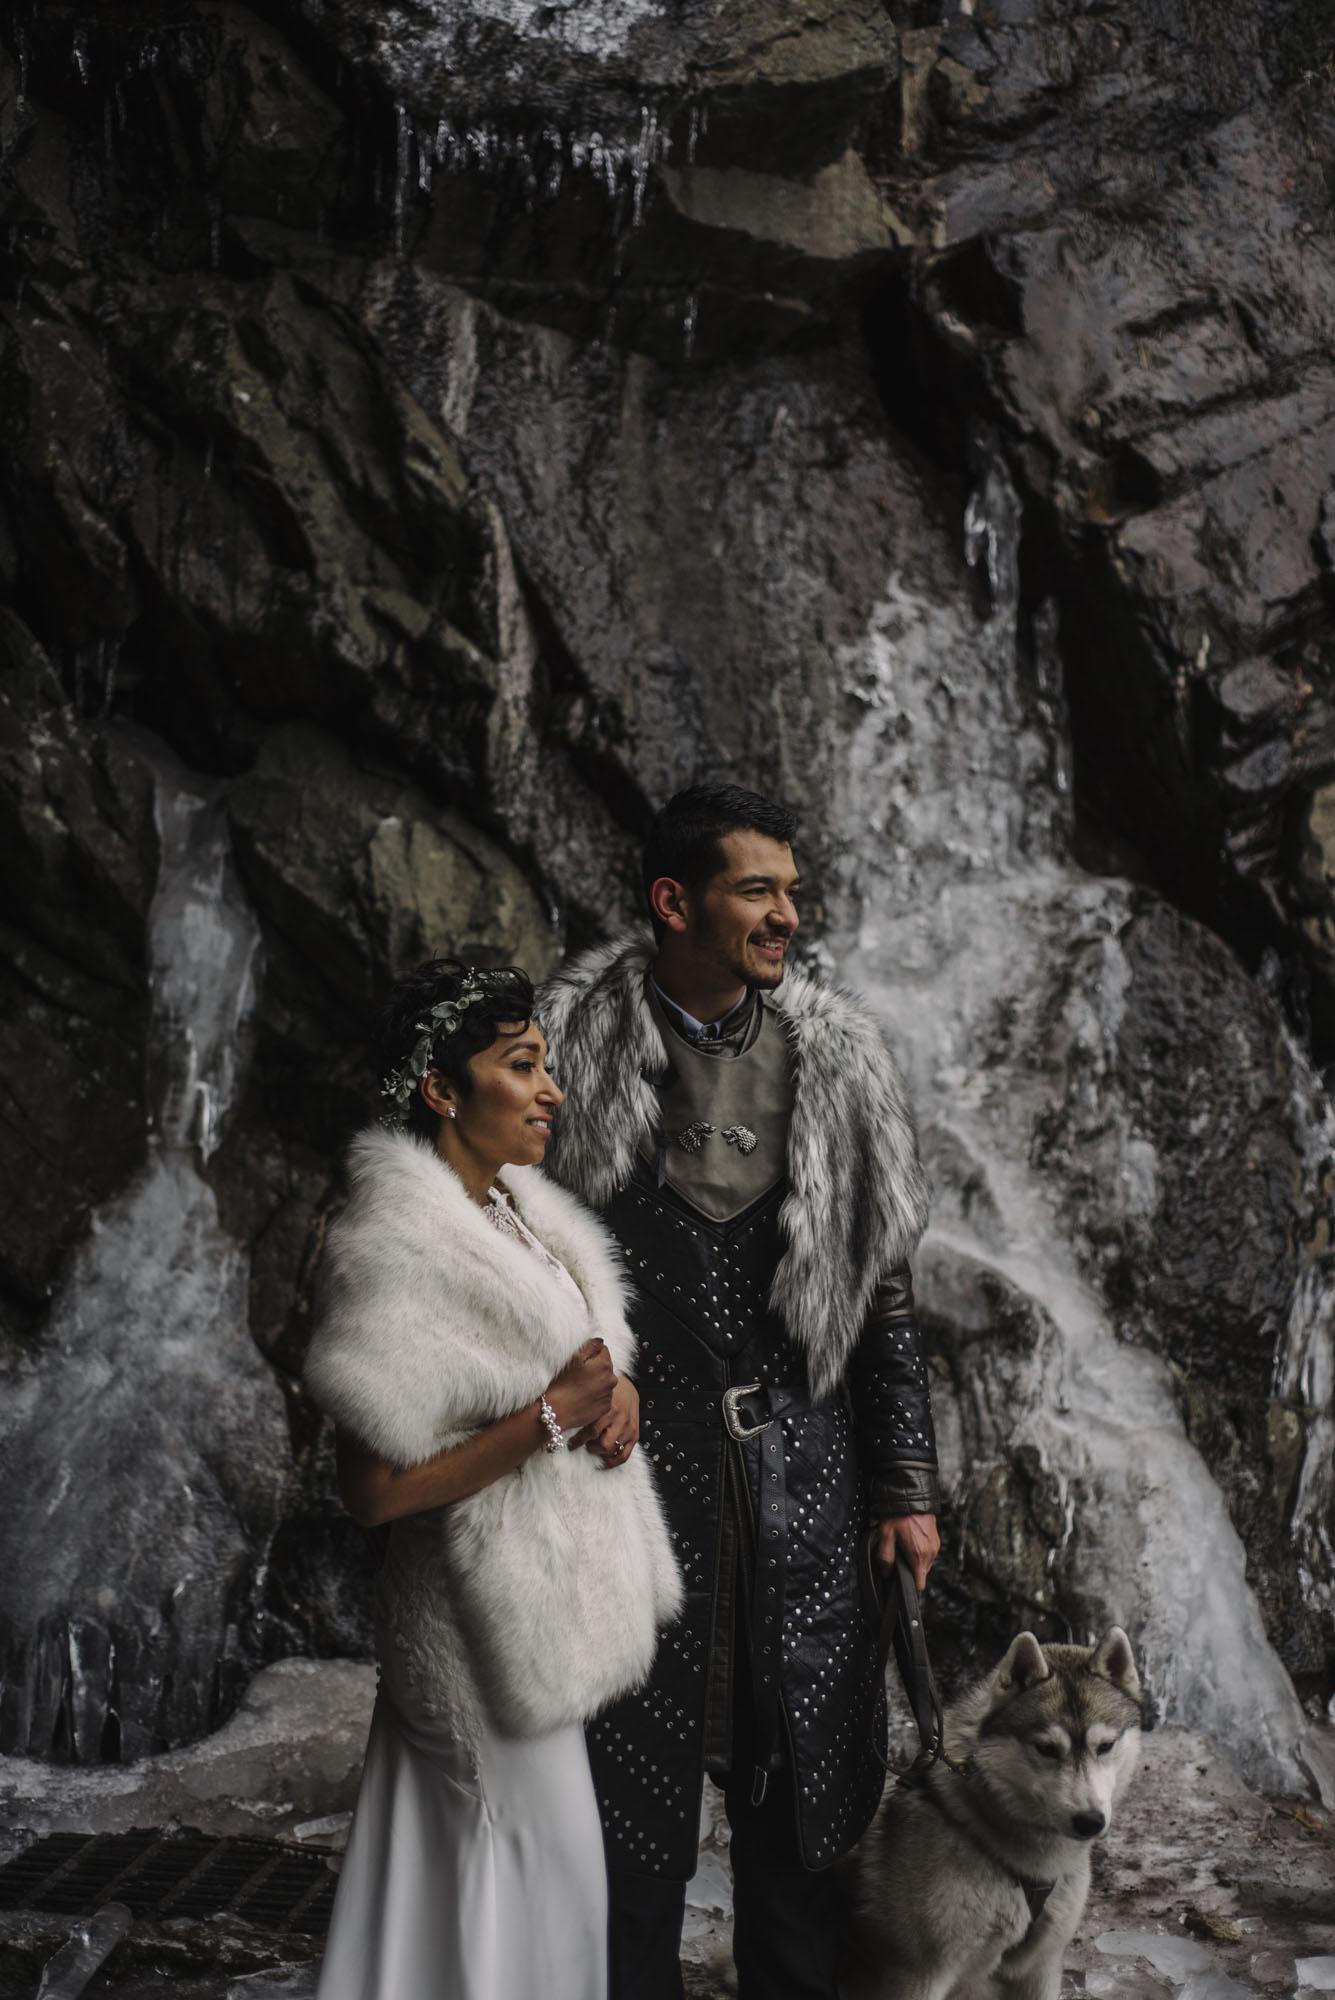 Game of Thrones Elopement - Winter Elopement - Shenandoah National Park Elopement Photographer - Virginia Adventure Photographer - Blue Ridge Parkway Elopement Photographer_1.jpg